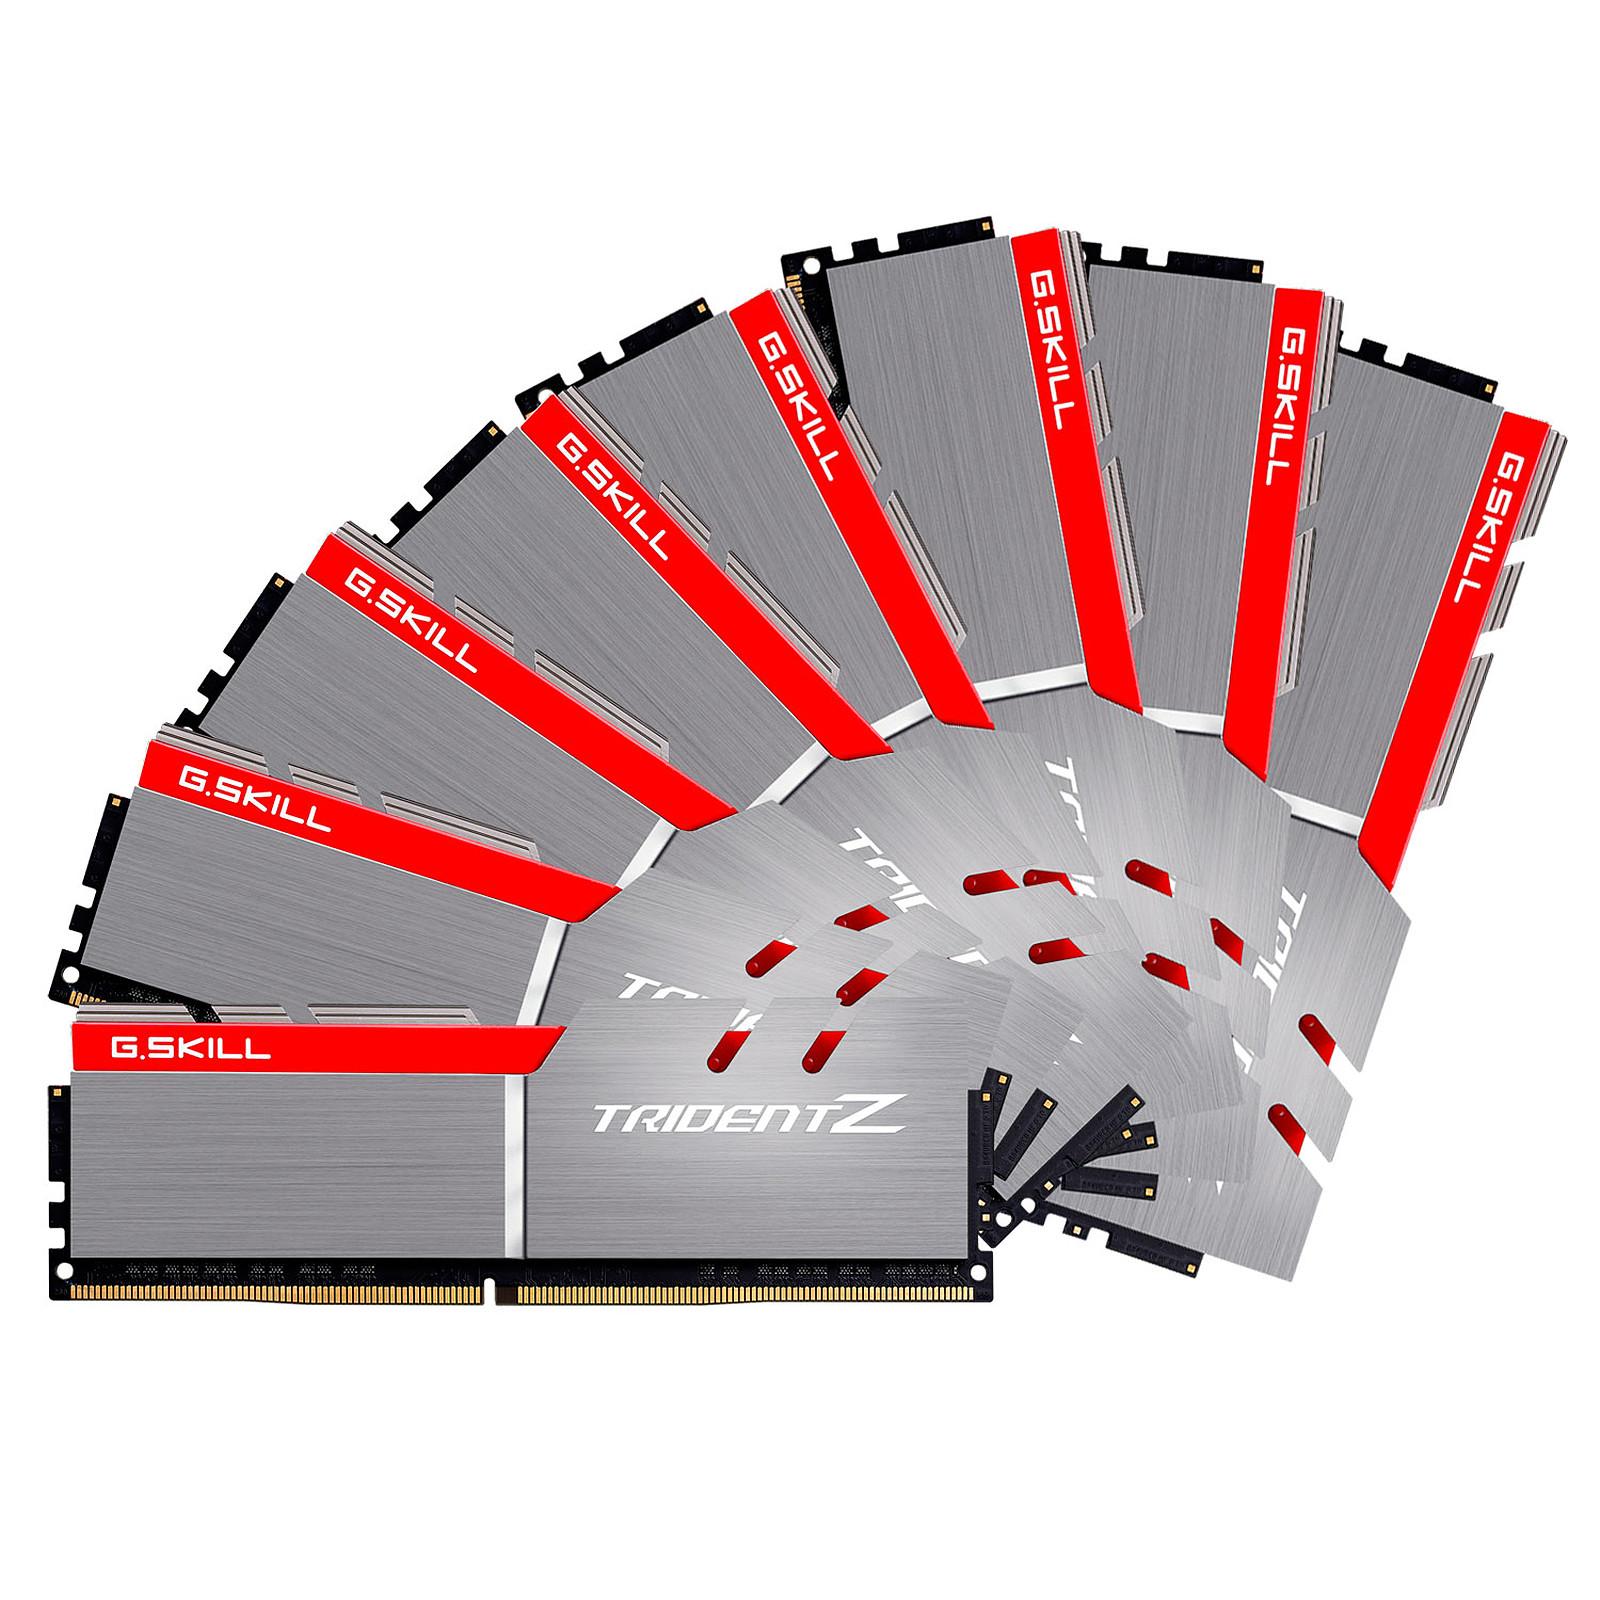 G.Skill Trident Z 64 GB (8x 8 GB) DDR4 3200 MHz CL15